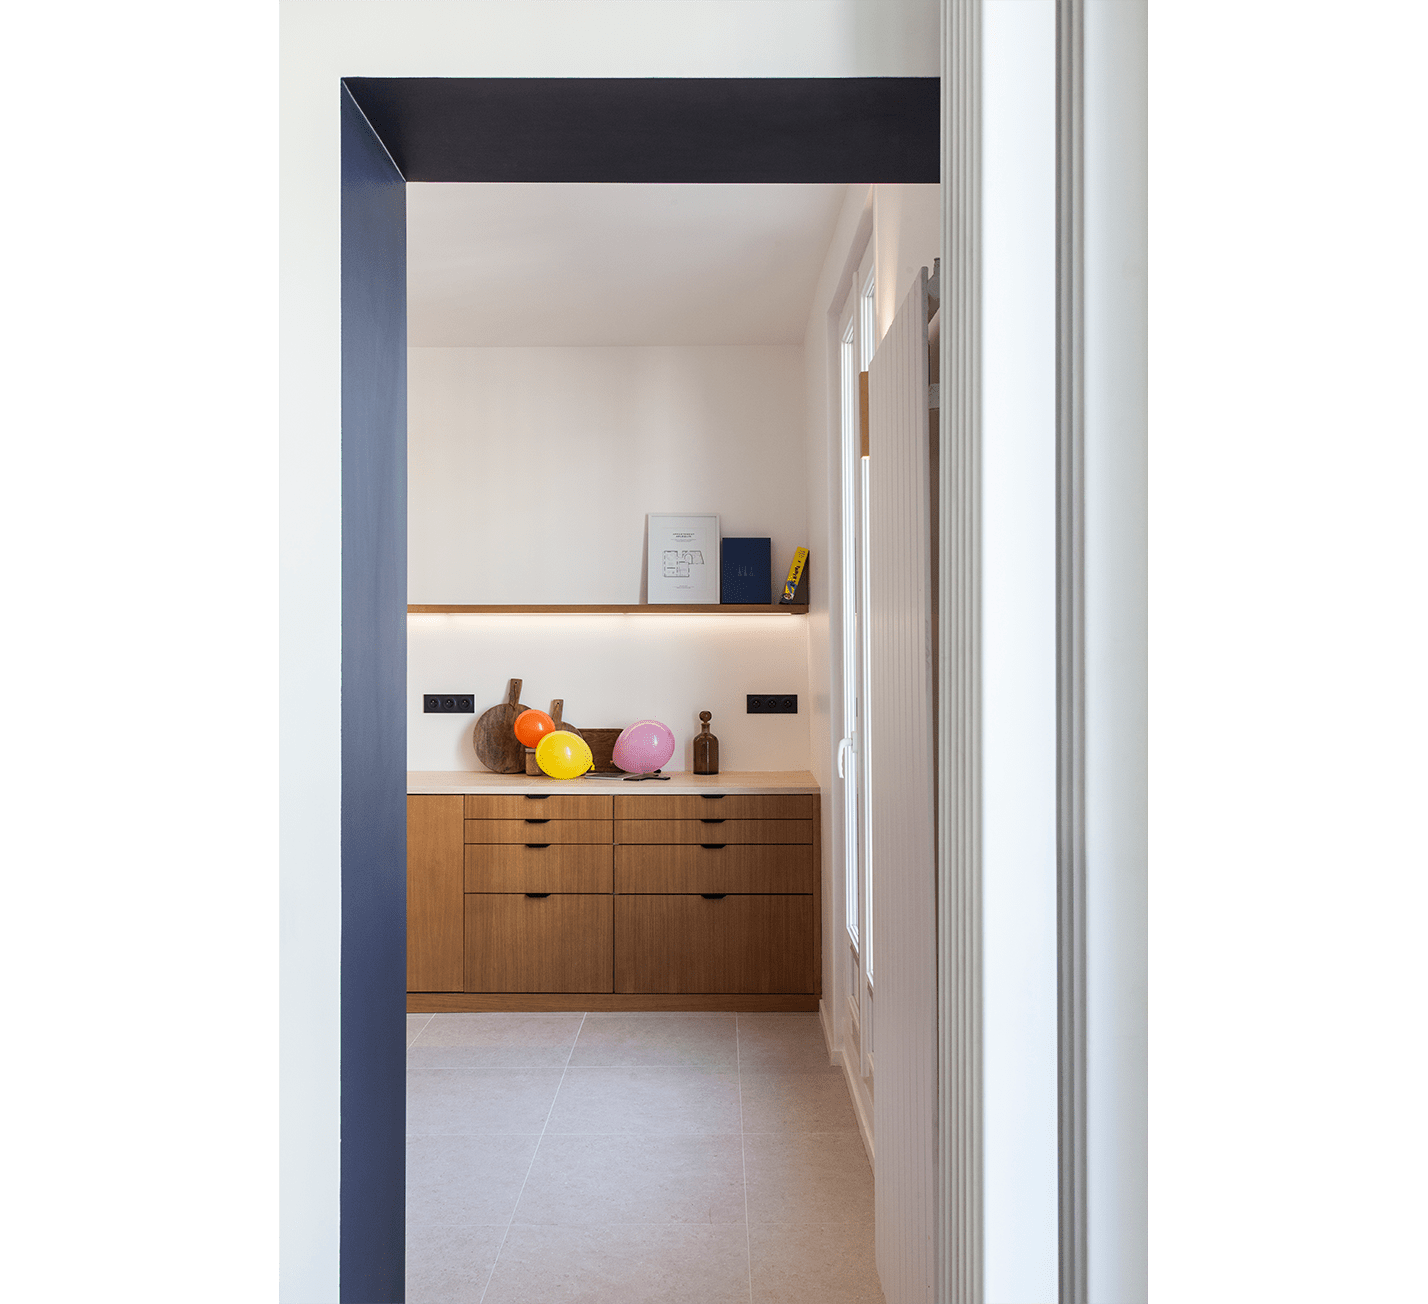 Projet-Arlequin-Atelier-Steve-Pauline-Borgia-Architecture-interieur-12-min